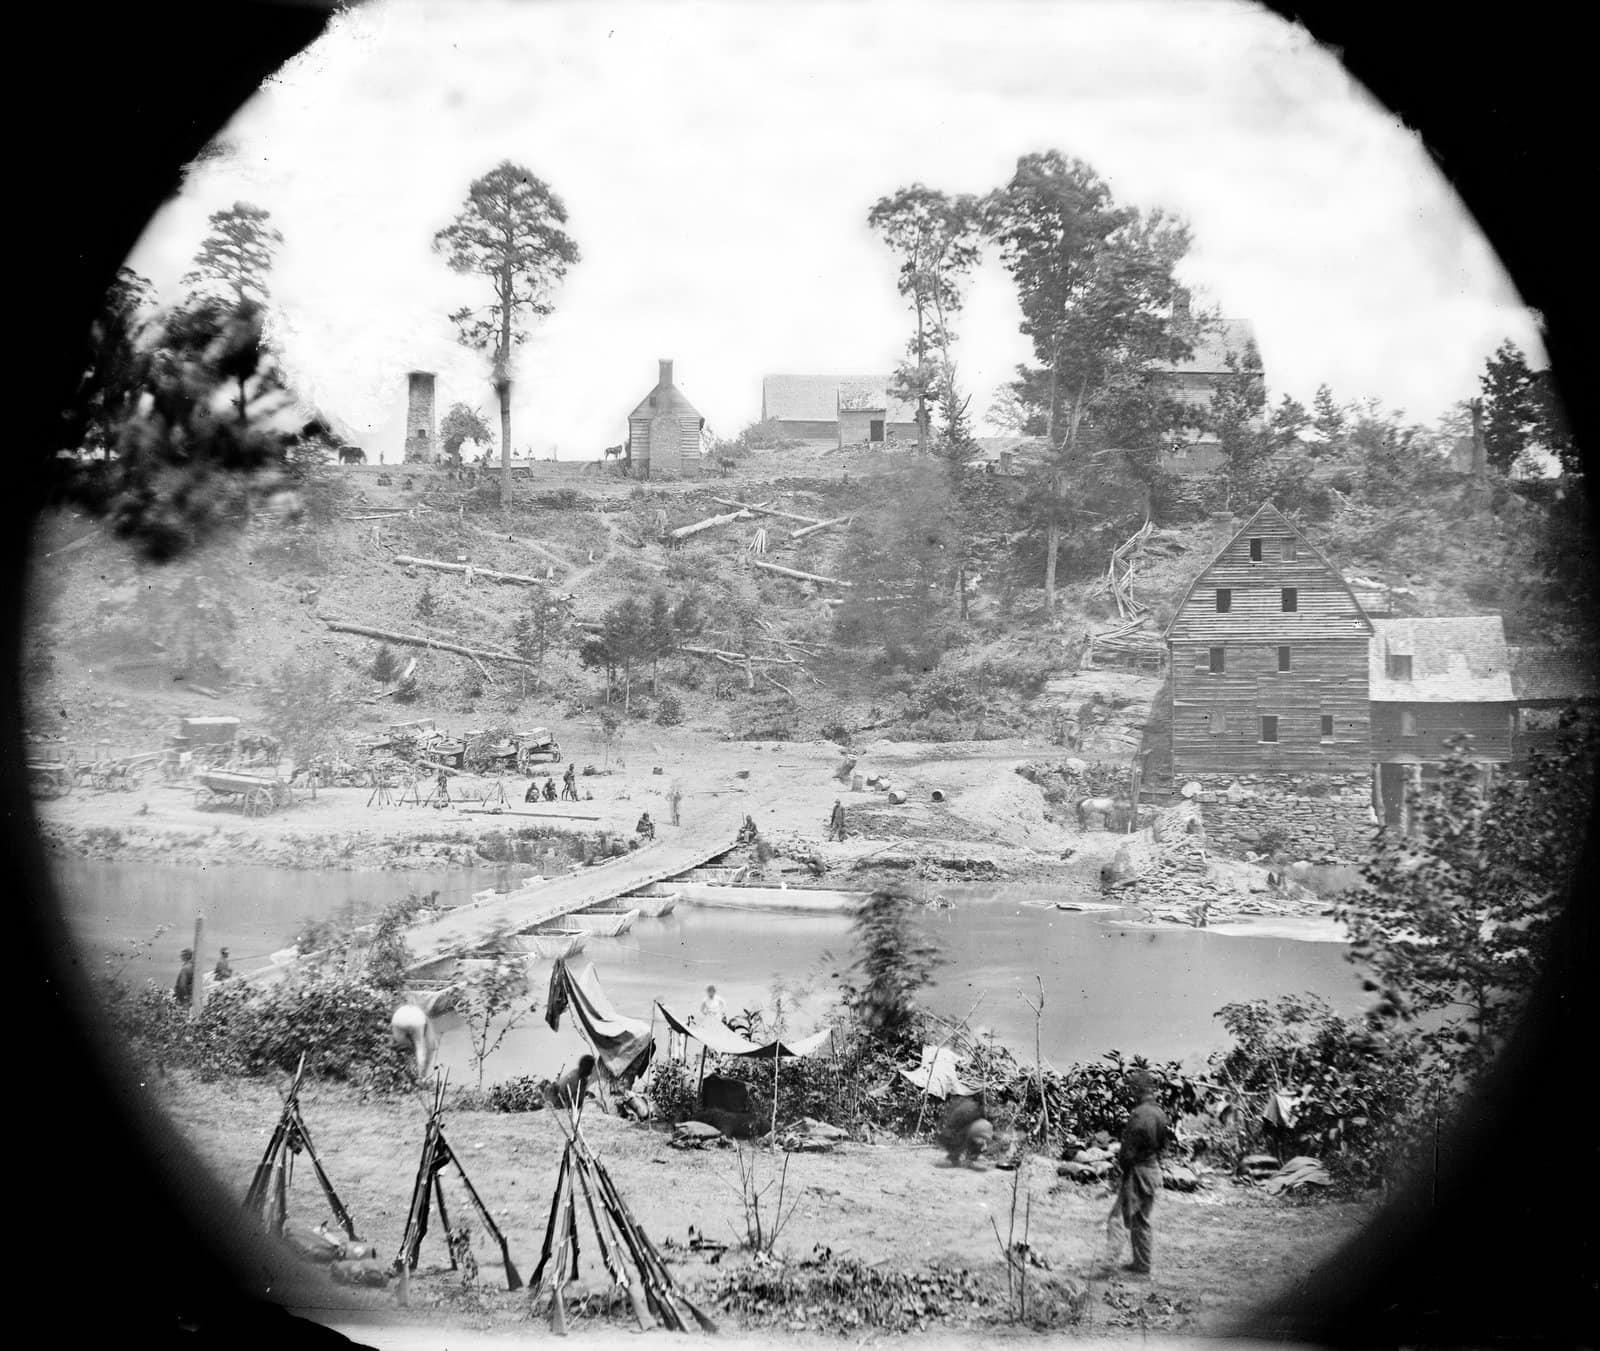 Scenes from Civil War Battle of the Wilderness (2)